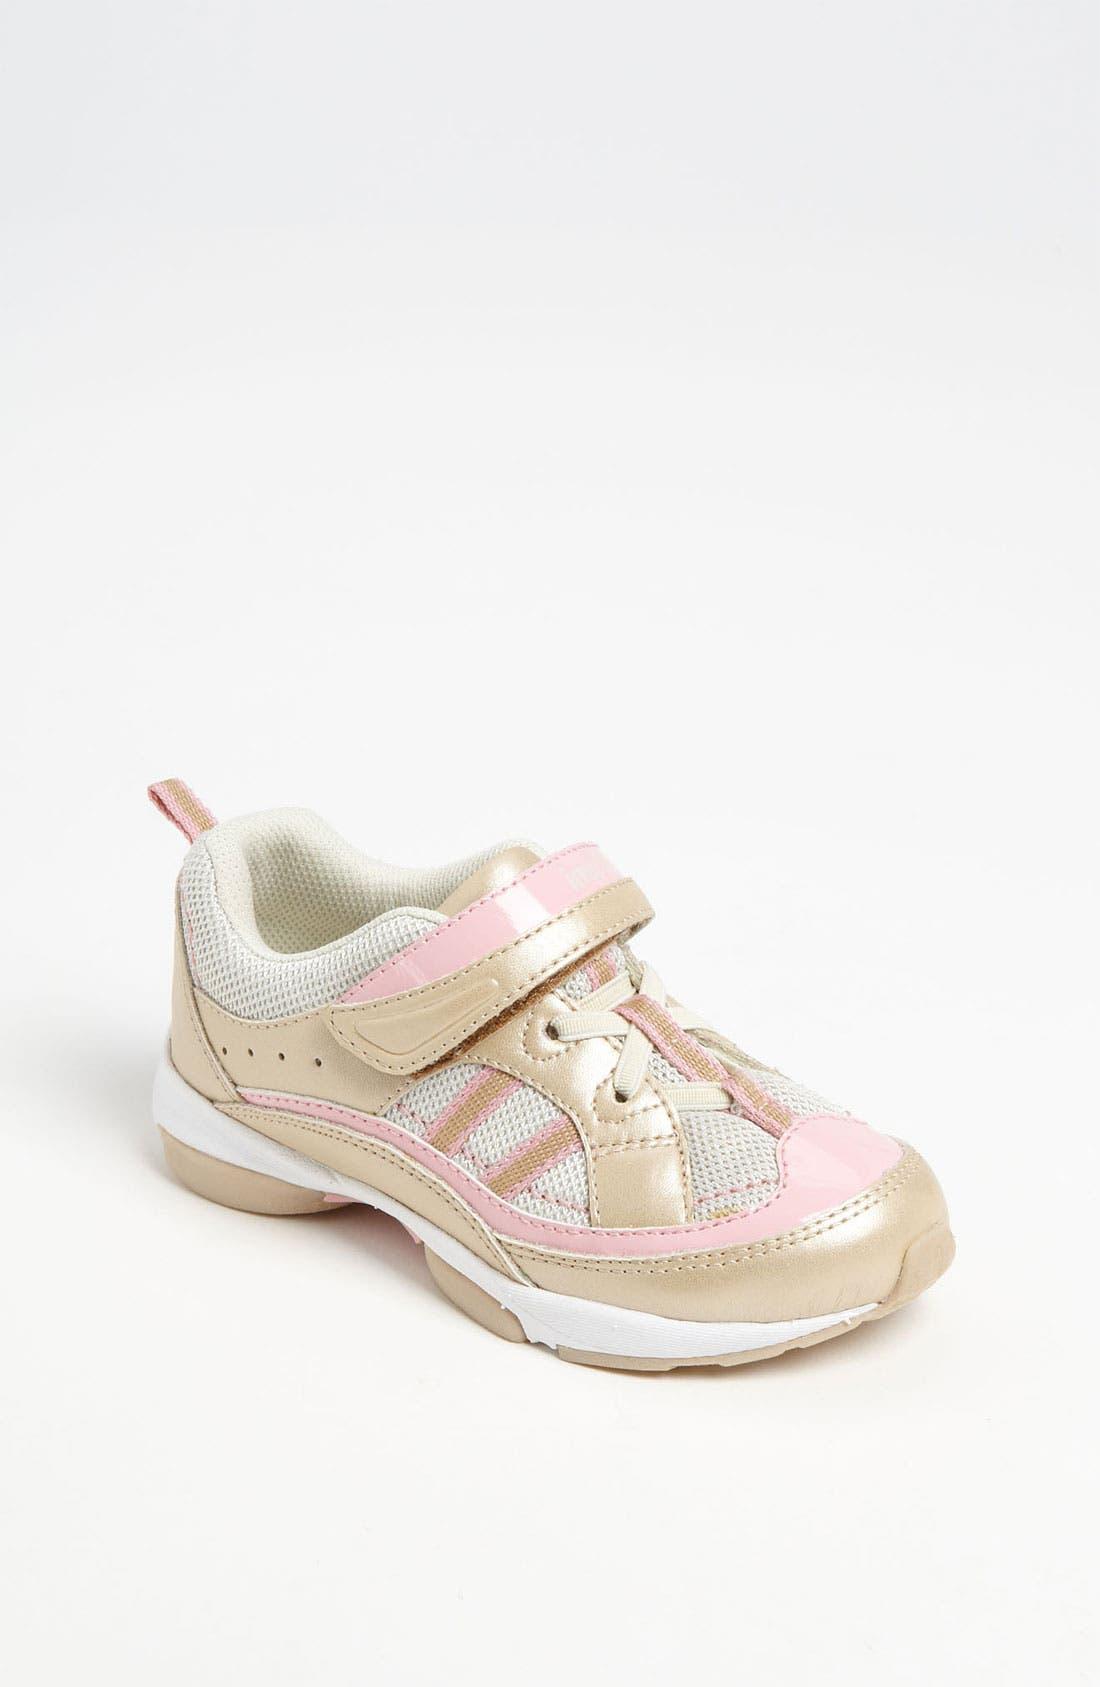 Main Image - Umi 'Connor' Sneaker (Toddler, Little Kid & Big Kid)